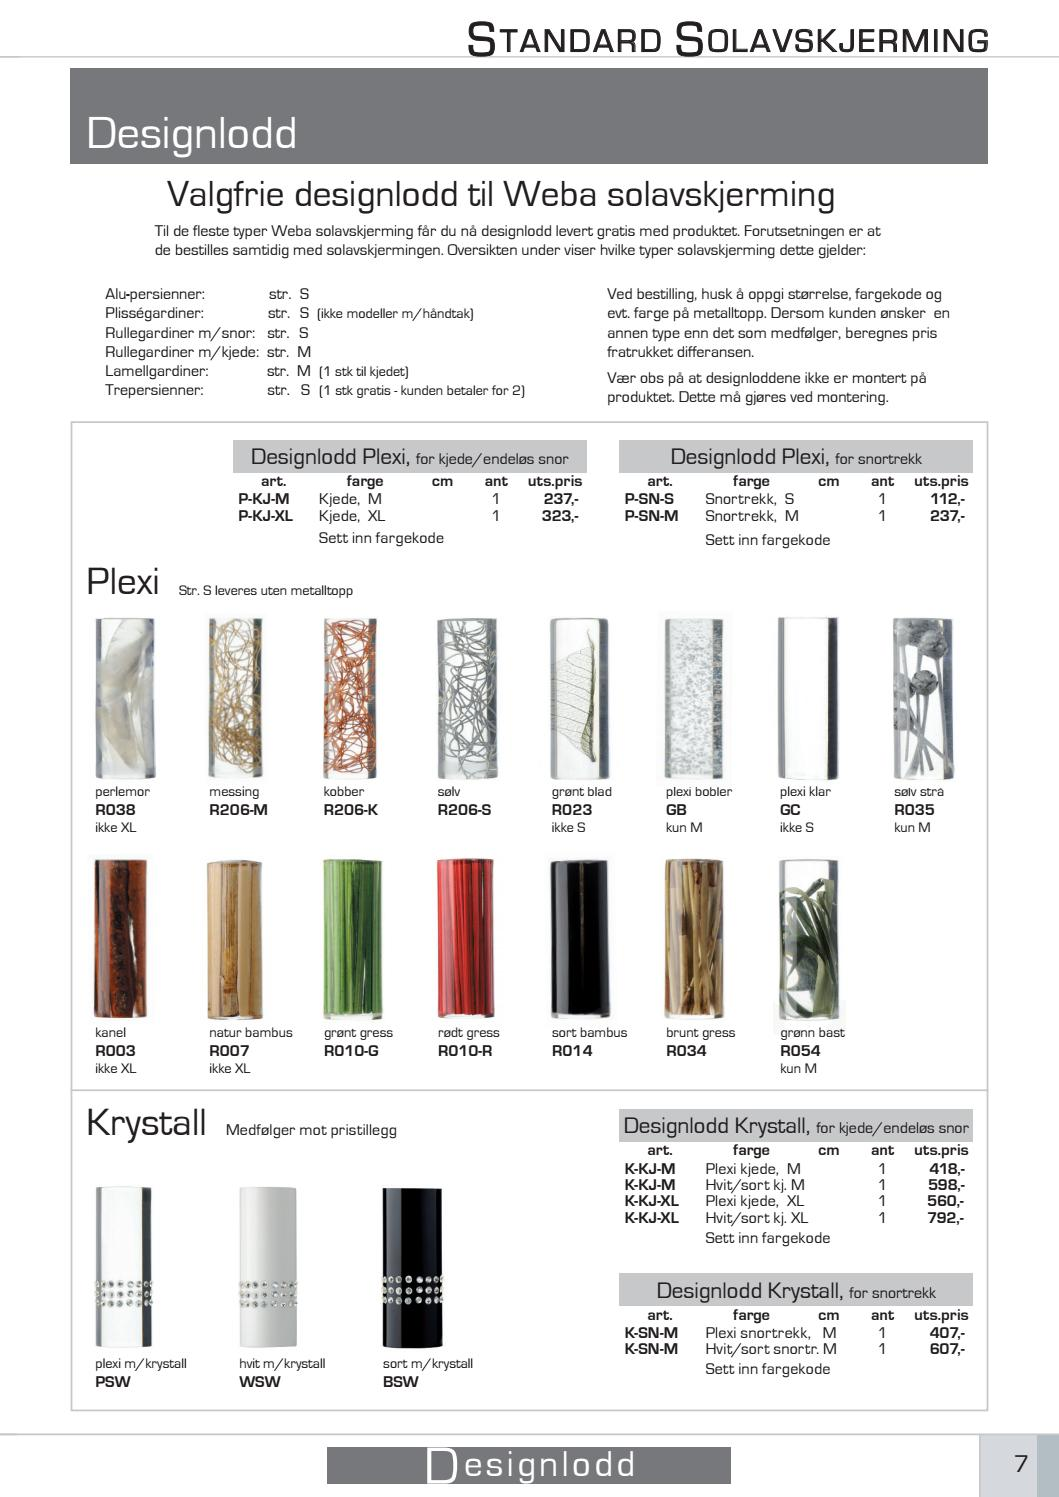 ae256df3 Standard Solavskjerming 2016 Katalog by Gasta design - issuu